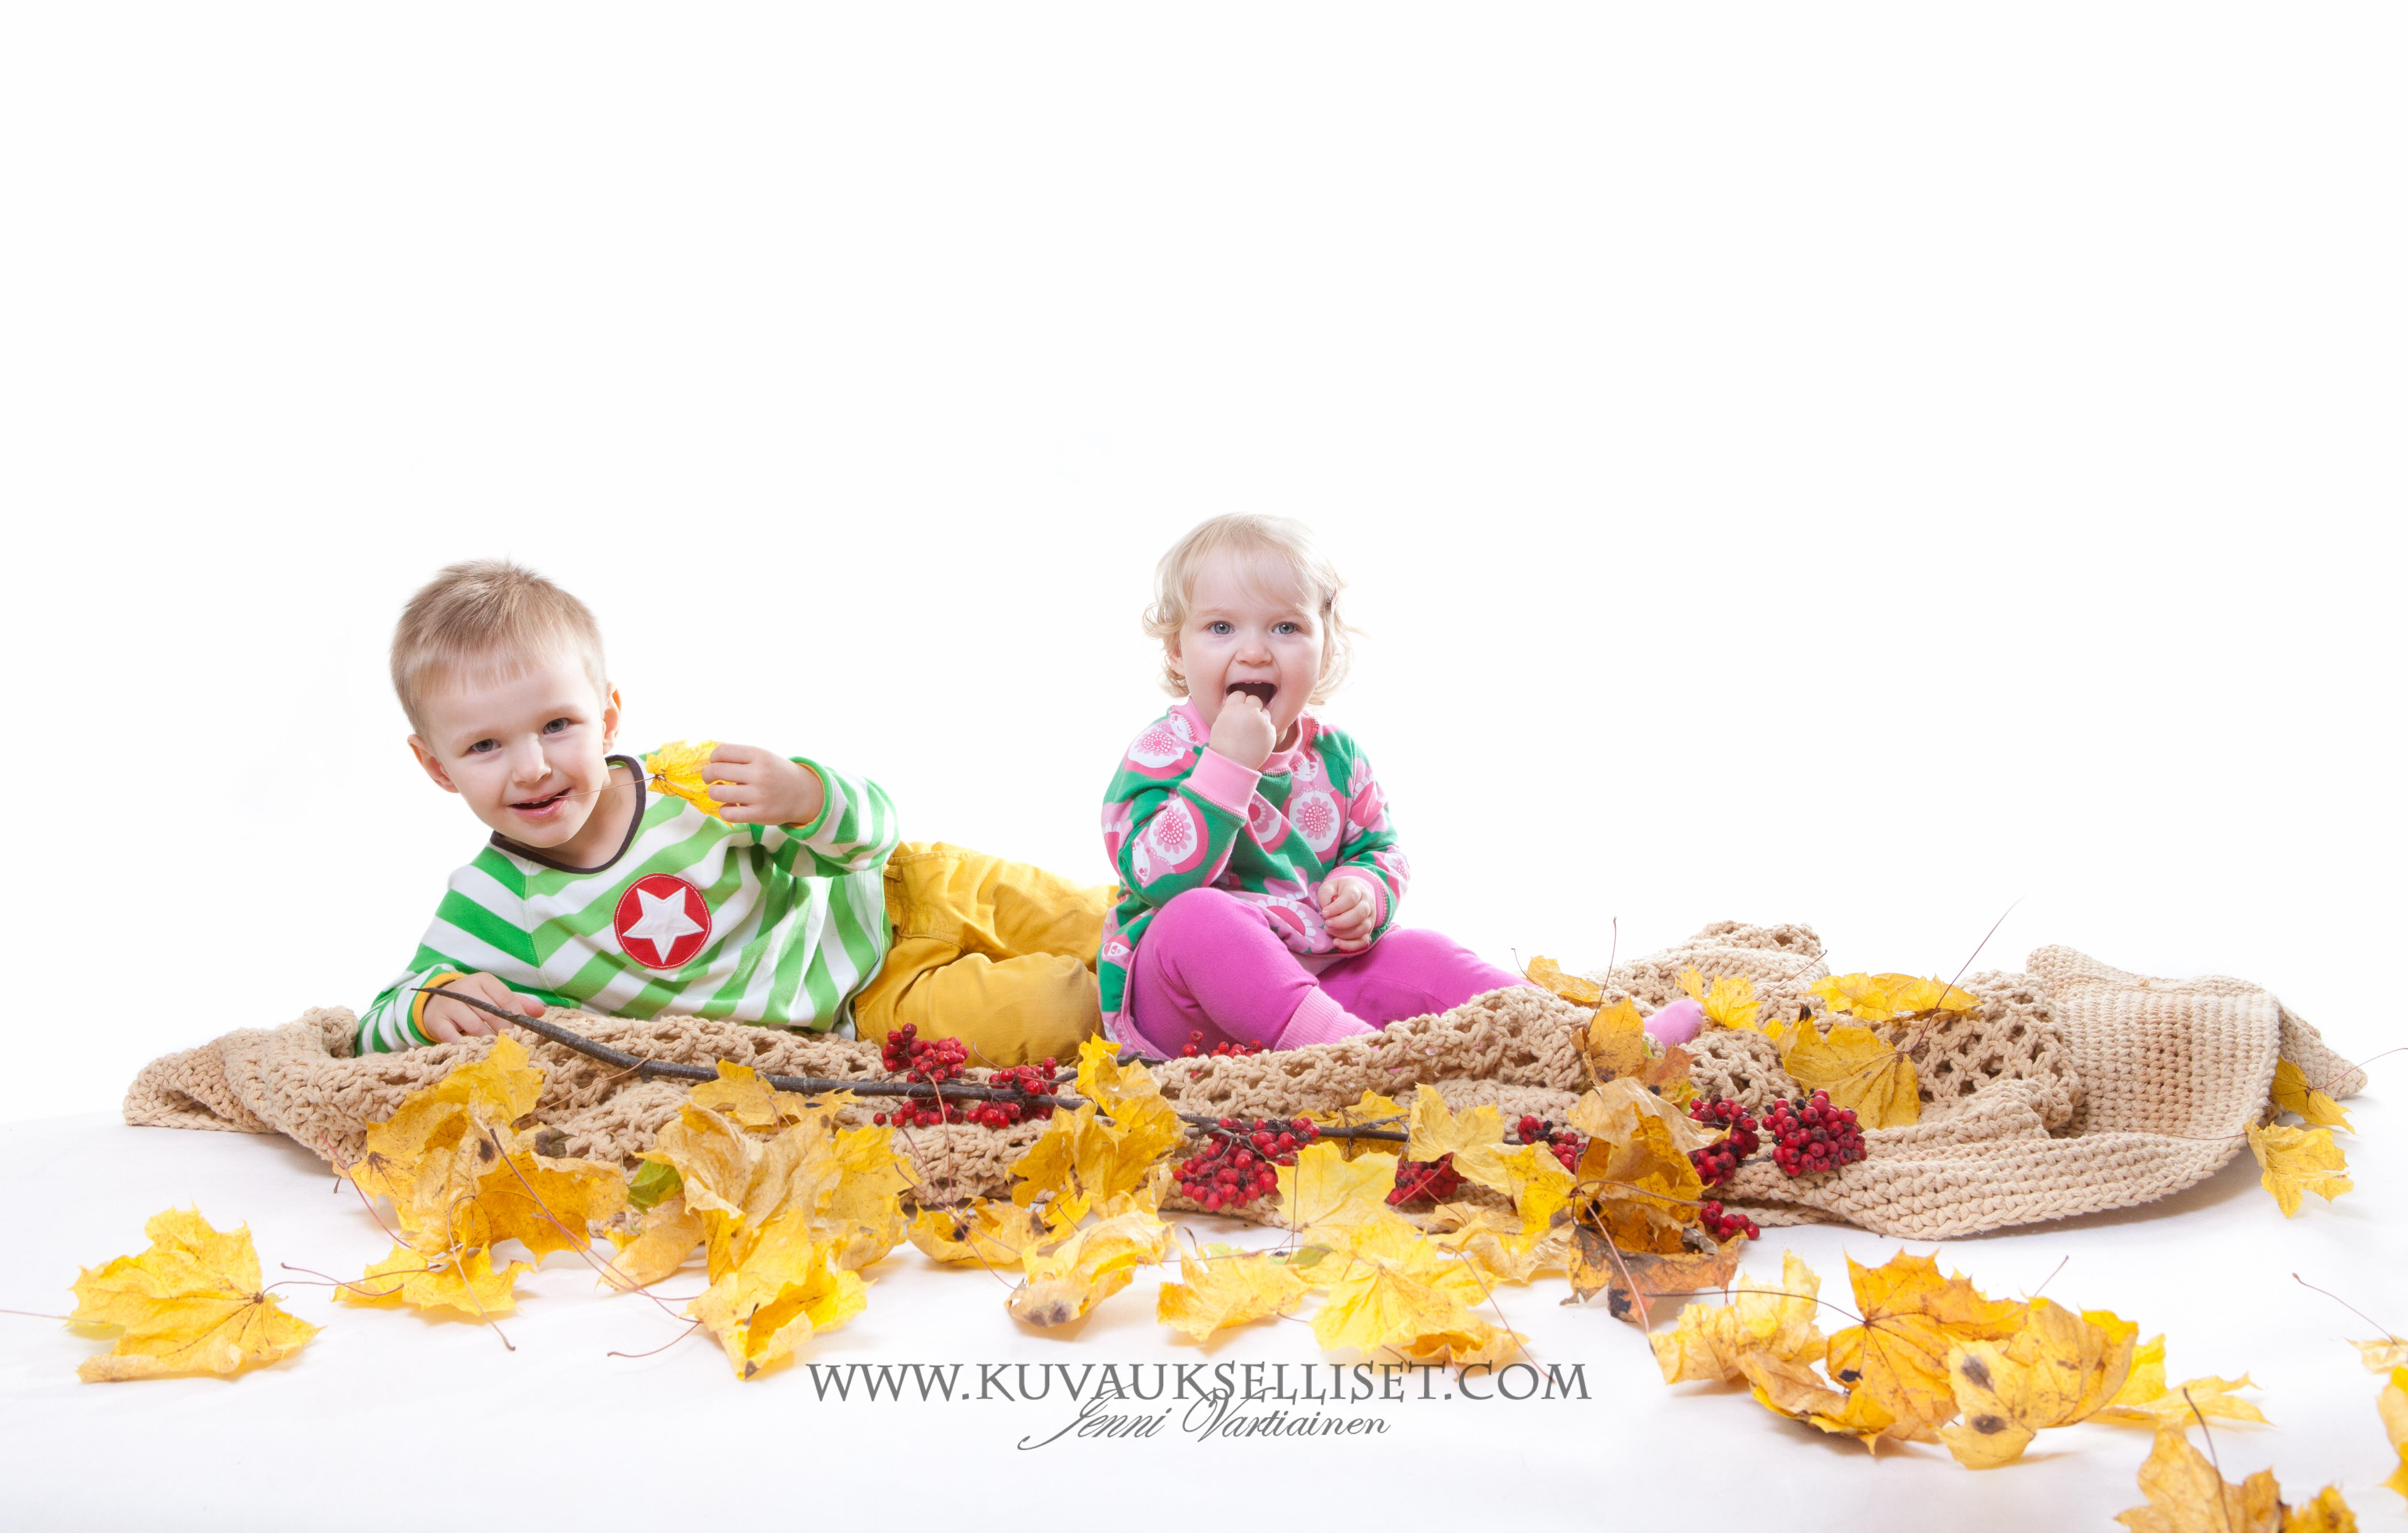 2014.10.19 Perhekuvaus lapsikuvaus studiokuvaus sisaruskuvaus 1-vuotiskuvaus muotokuva-4